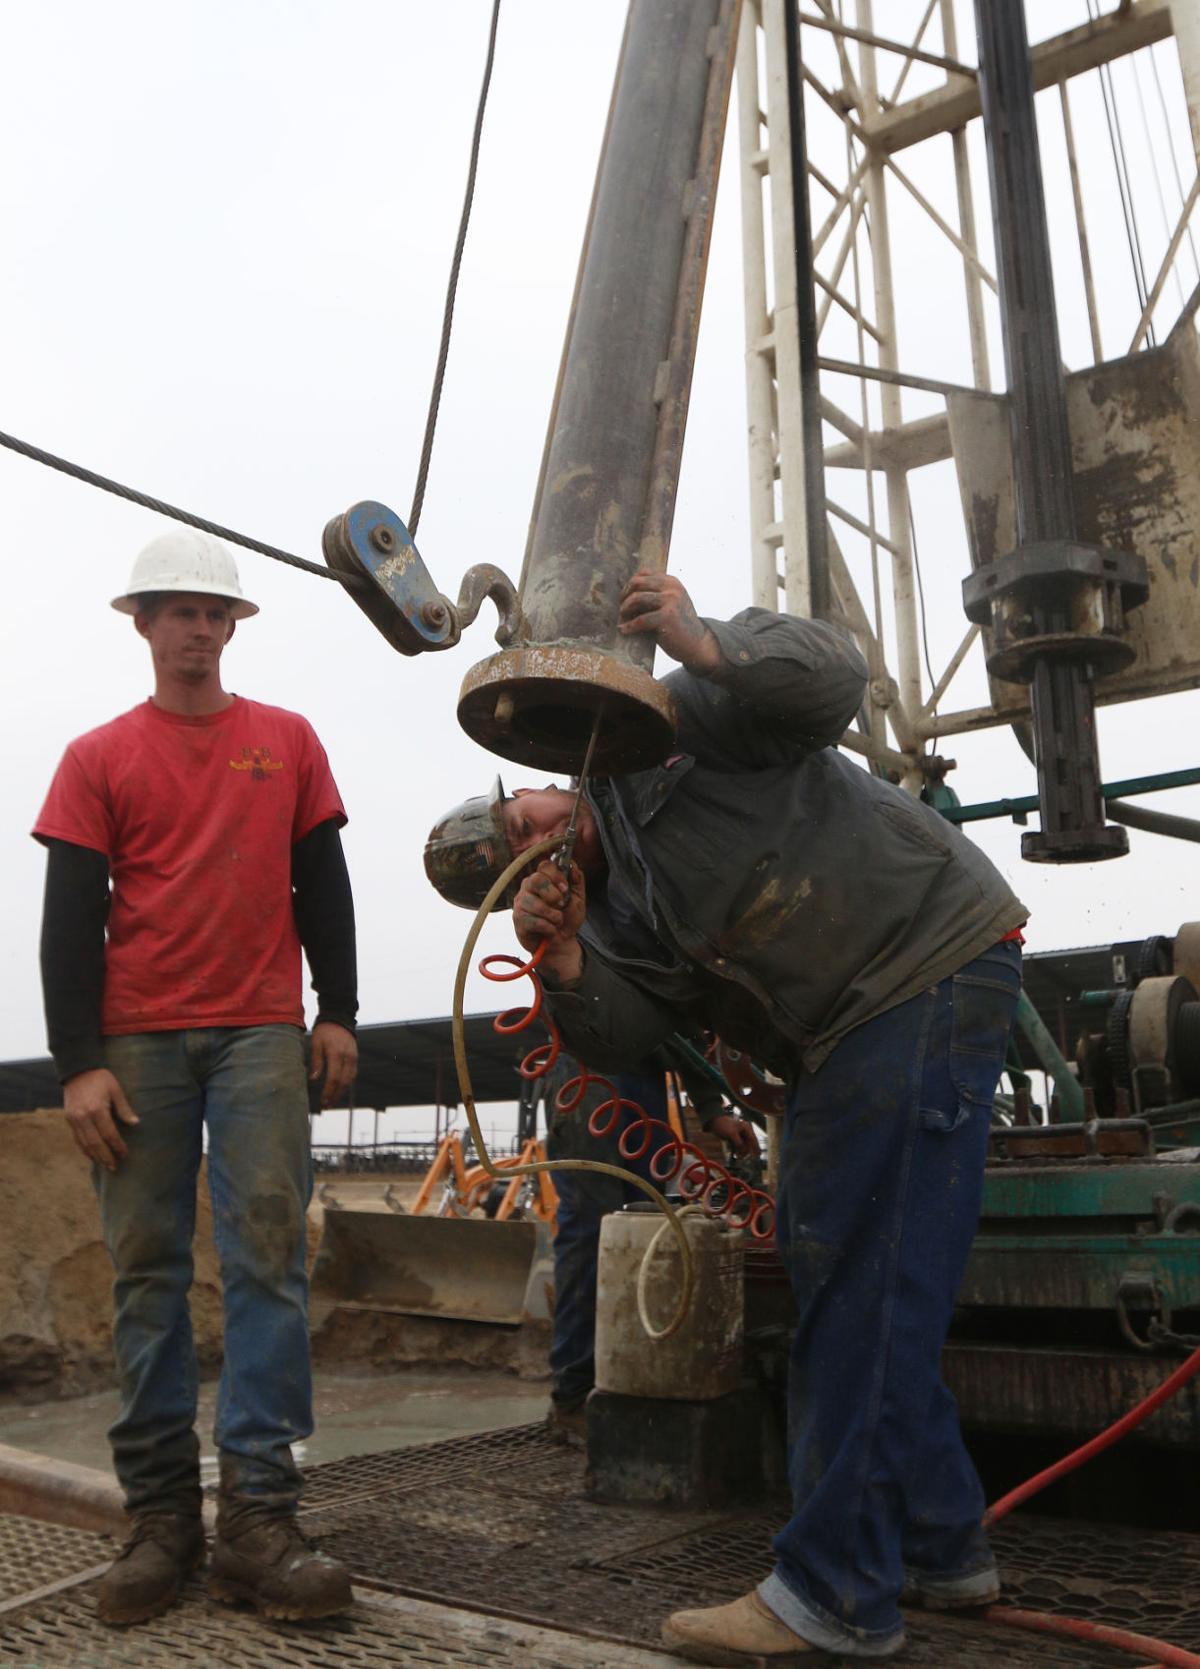 Well drilling on 16th Avenue near Flint avenue